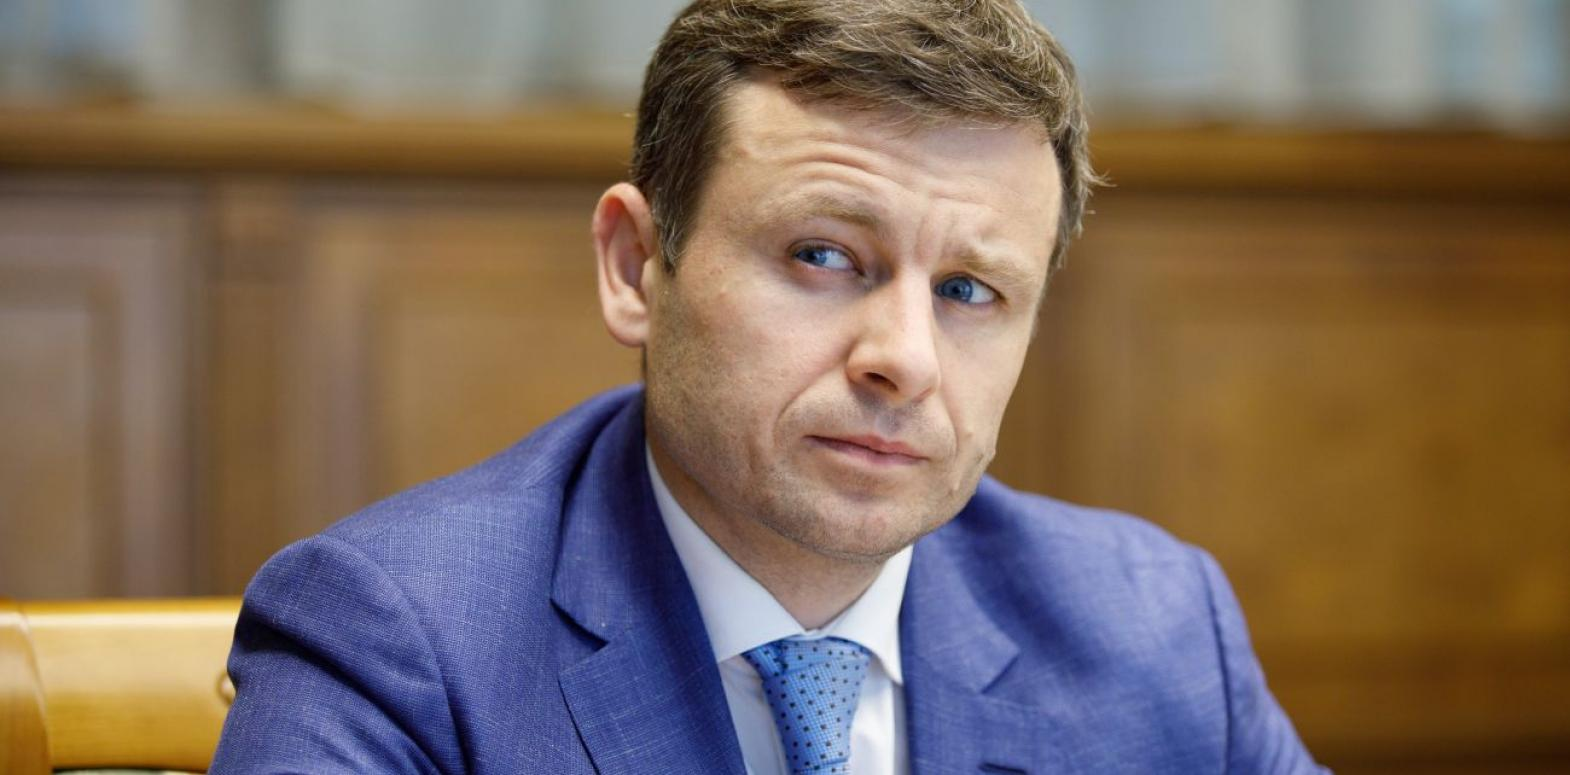 Марченко сообщил, когда обнародуют меморандум с МВФ